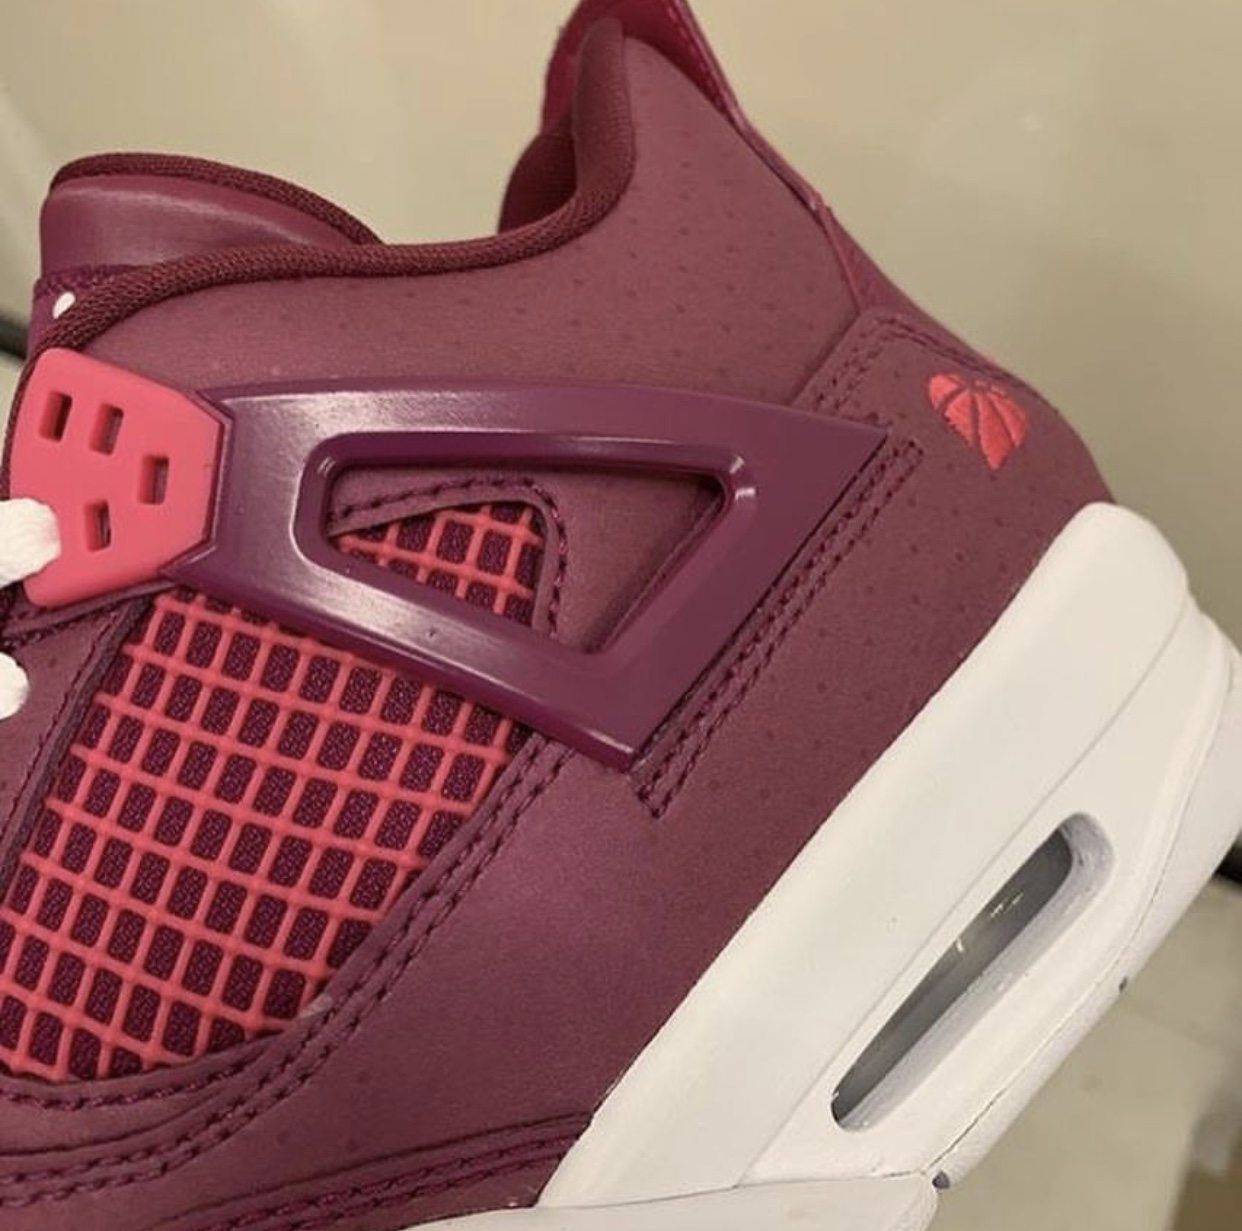 Air Jordan 4 True Berry Valentines Day 487724 661 Release